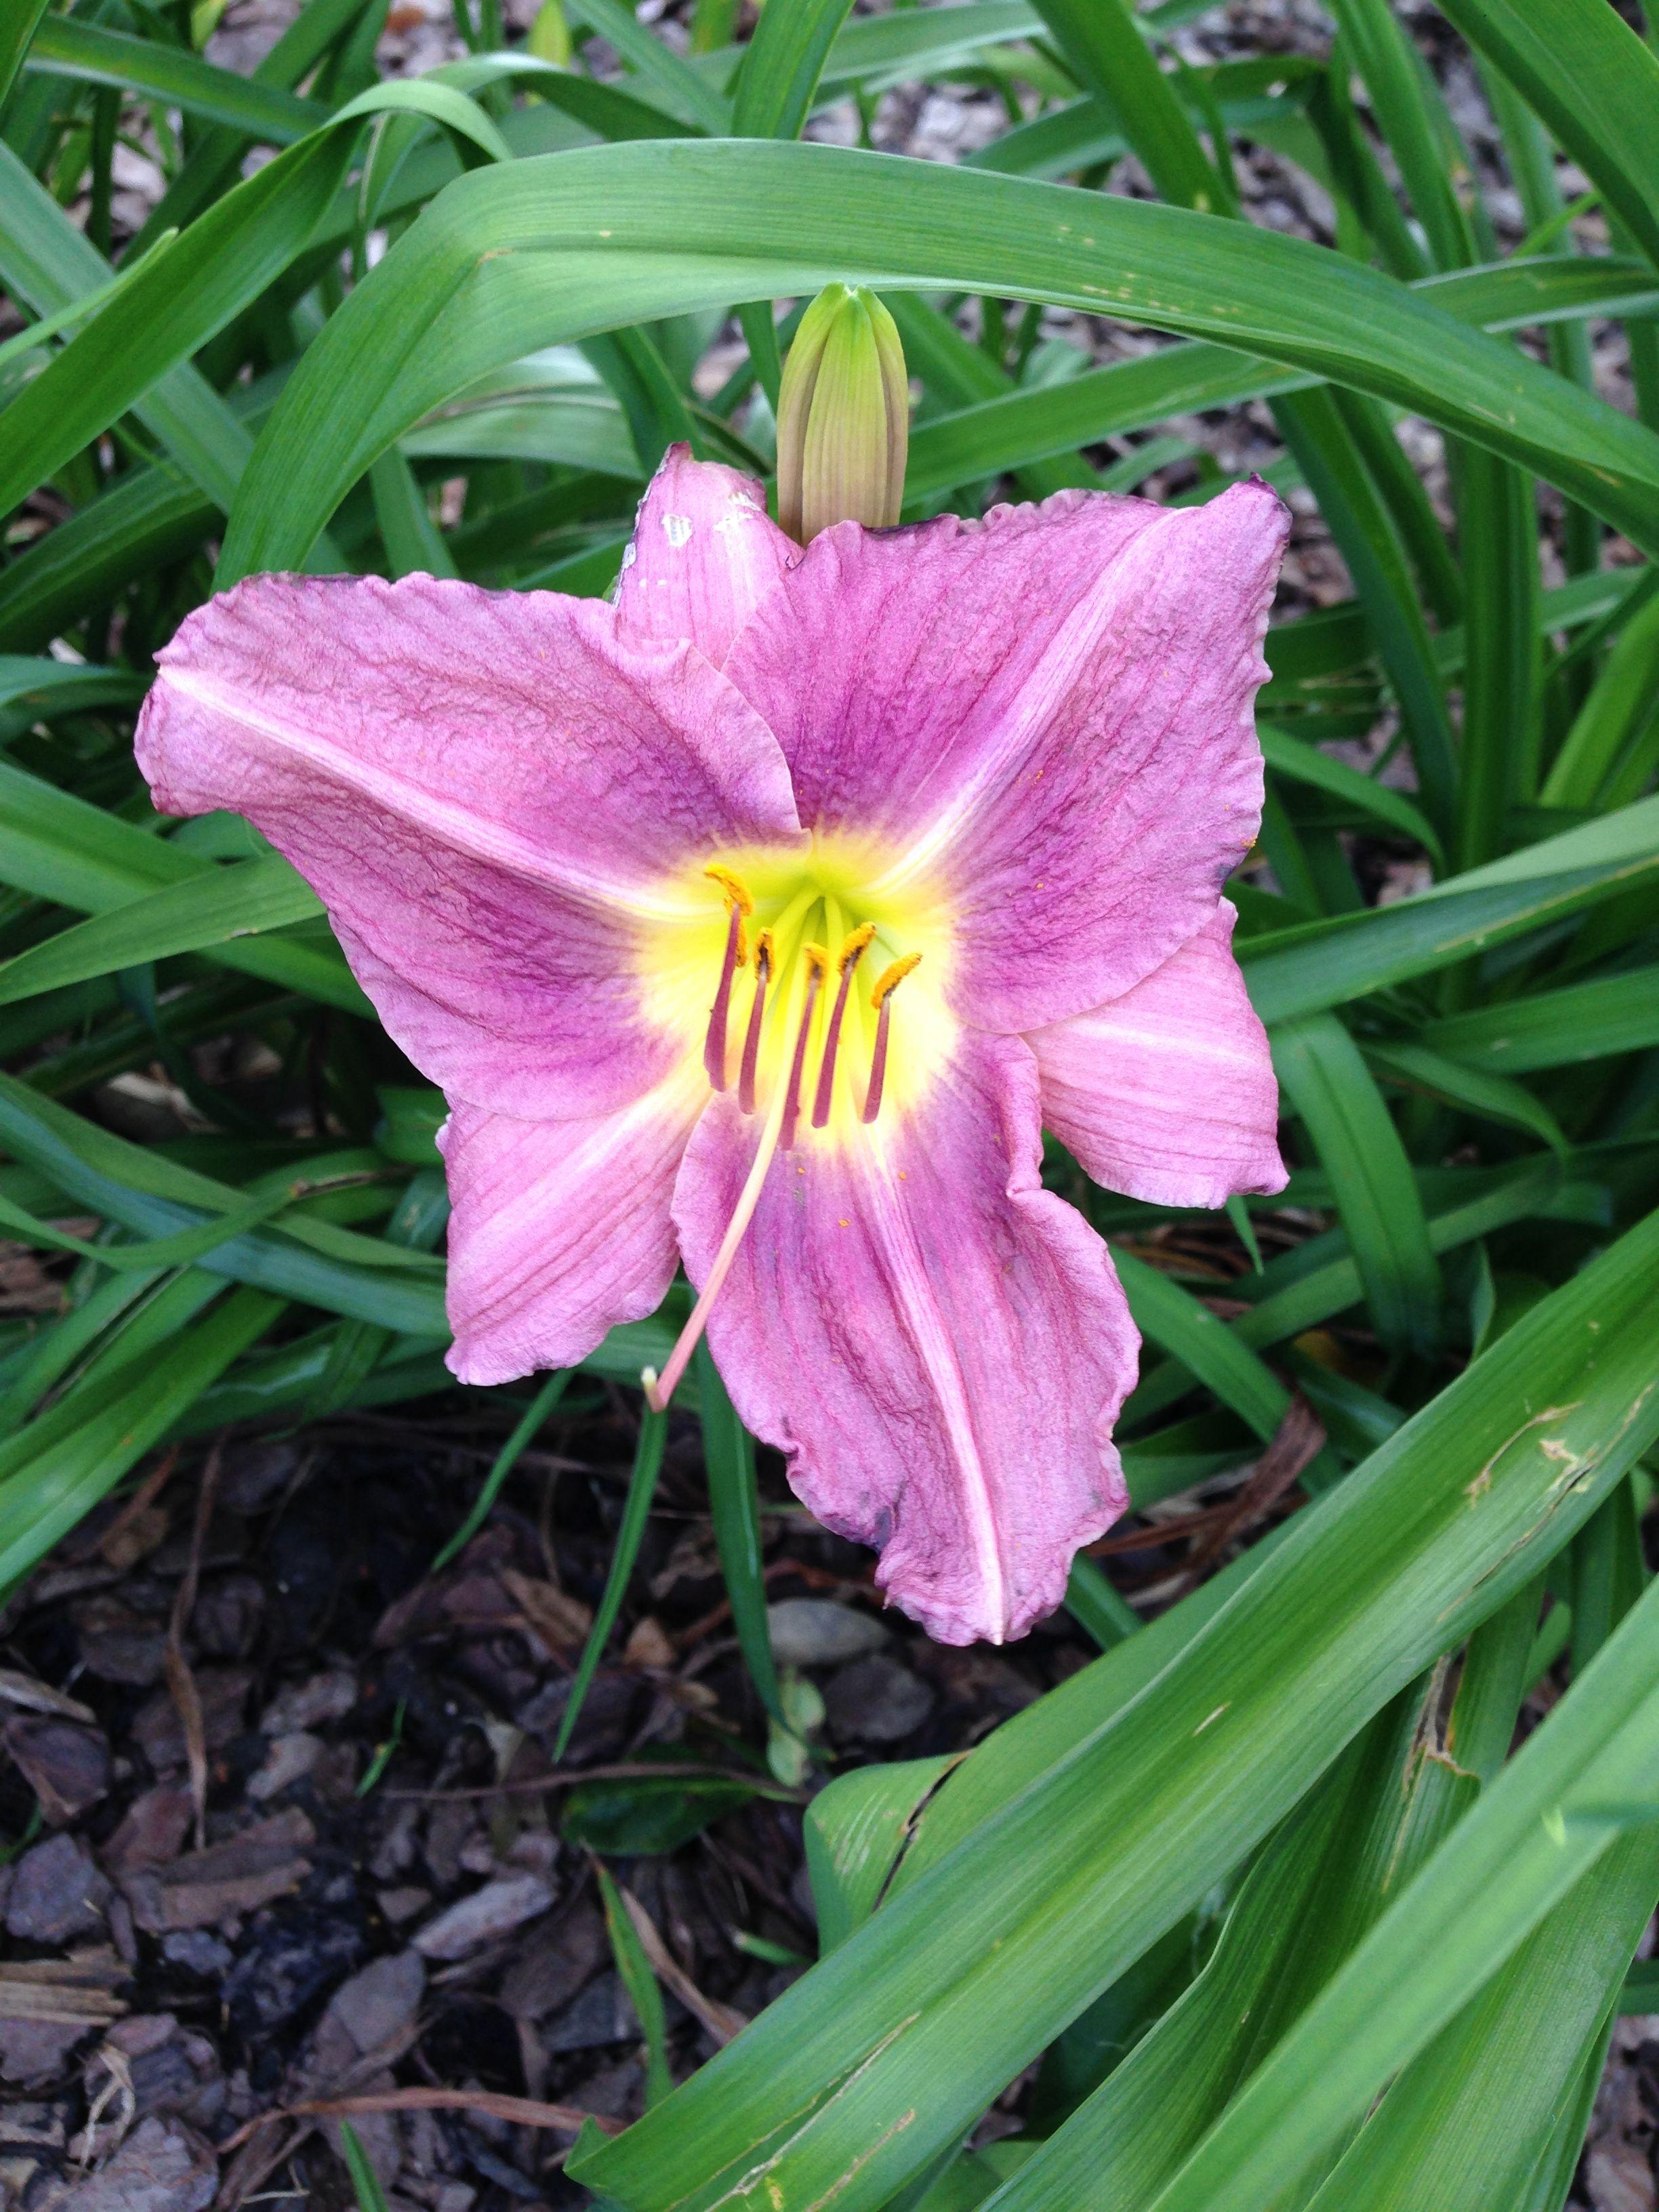 Purple lily my flowers pinterest purple lily purple lily izmirmasajfo